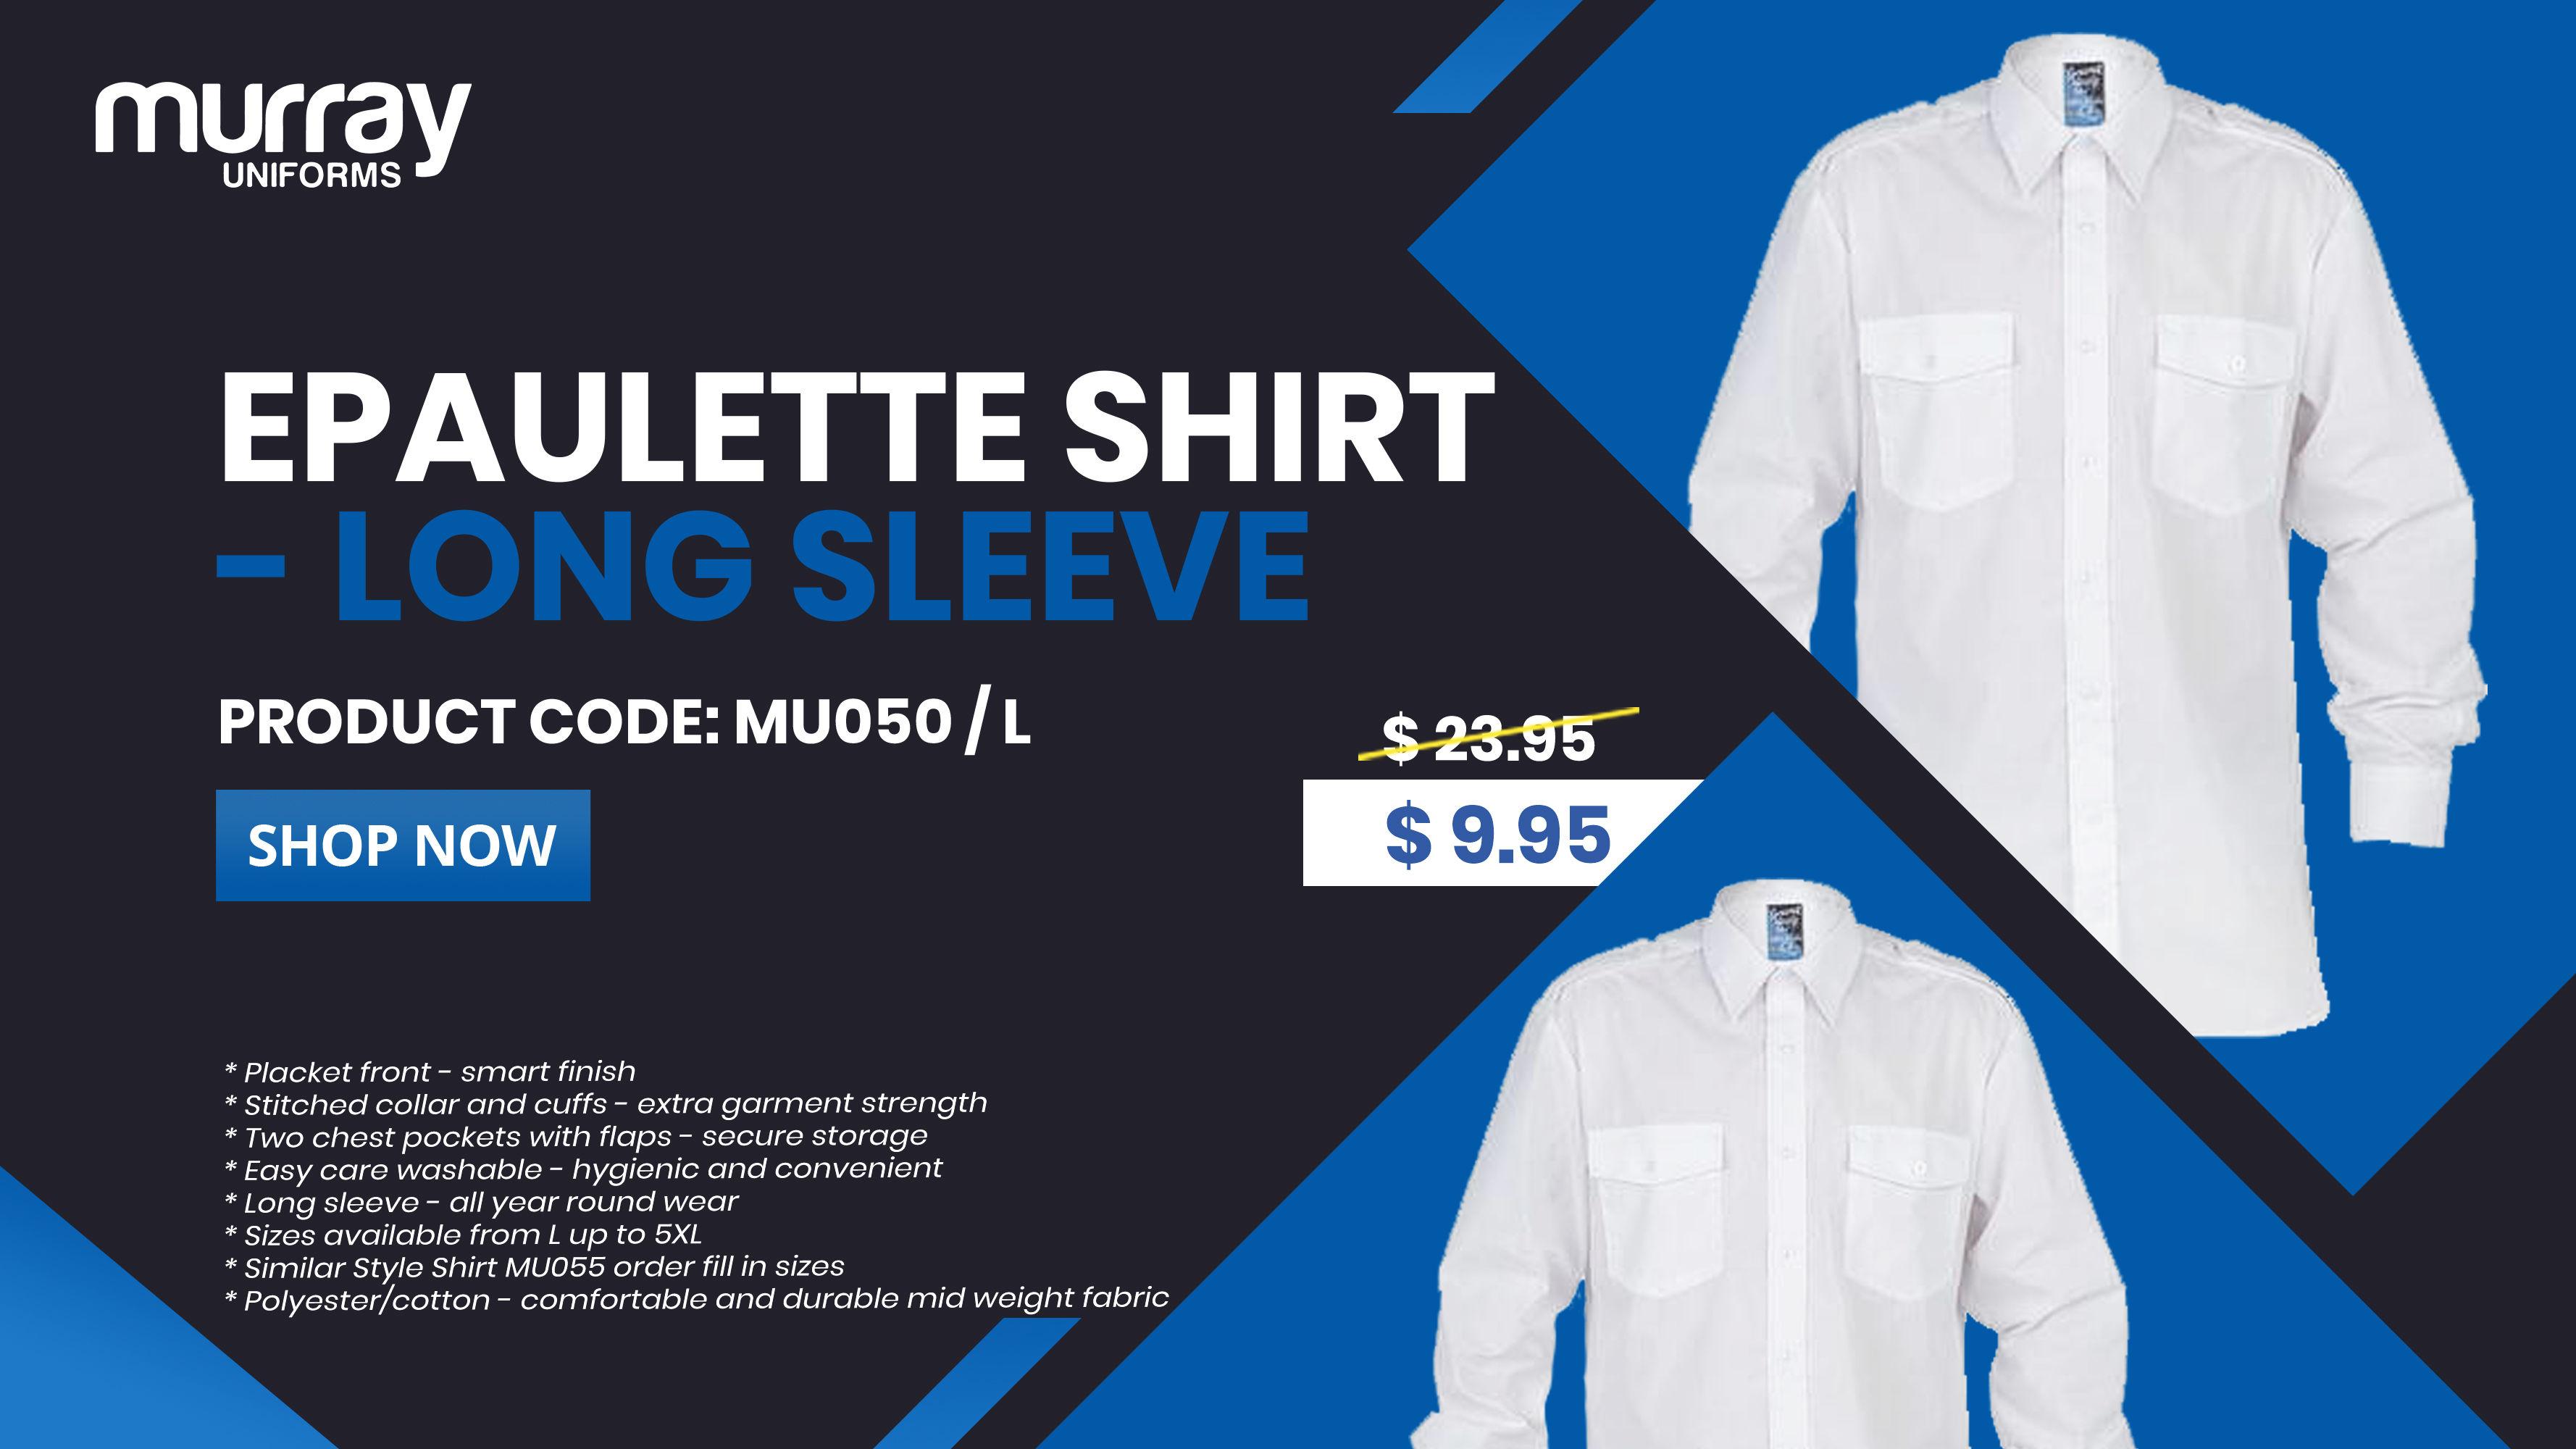 Pilot Shirts with Epaulets